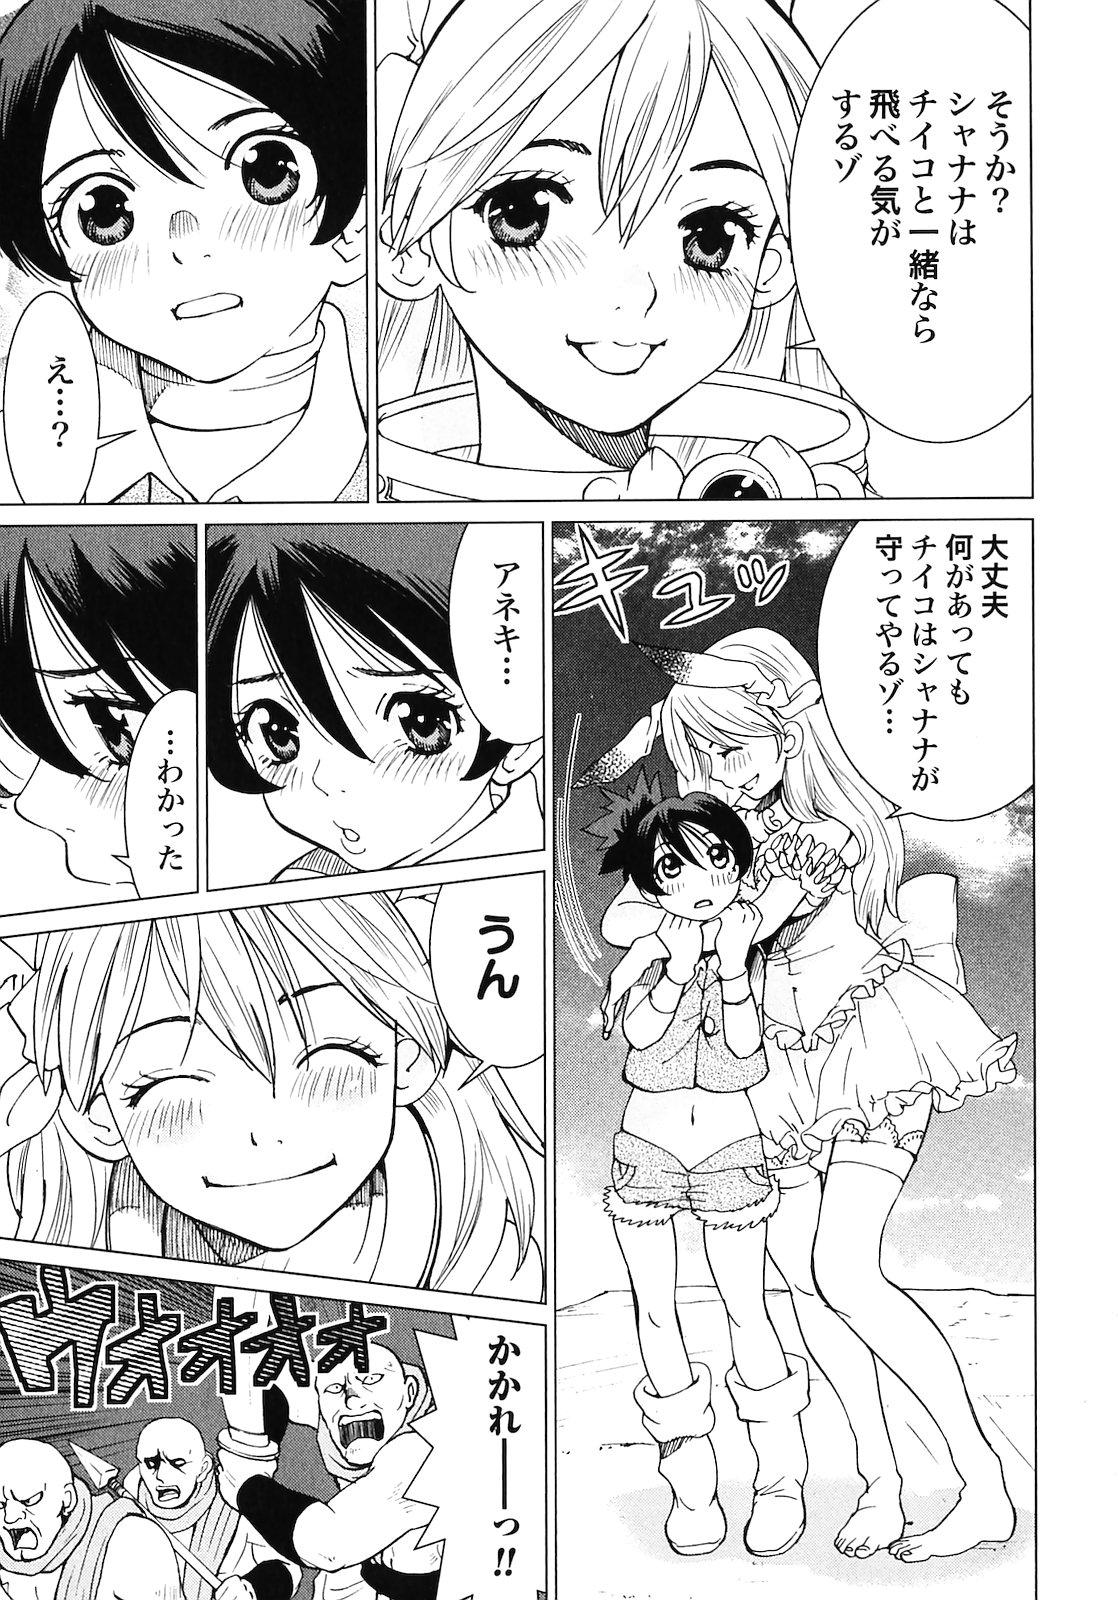 Makyo no Shanana Vol.02 172